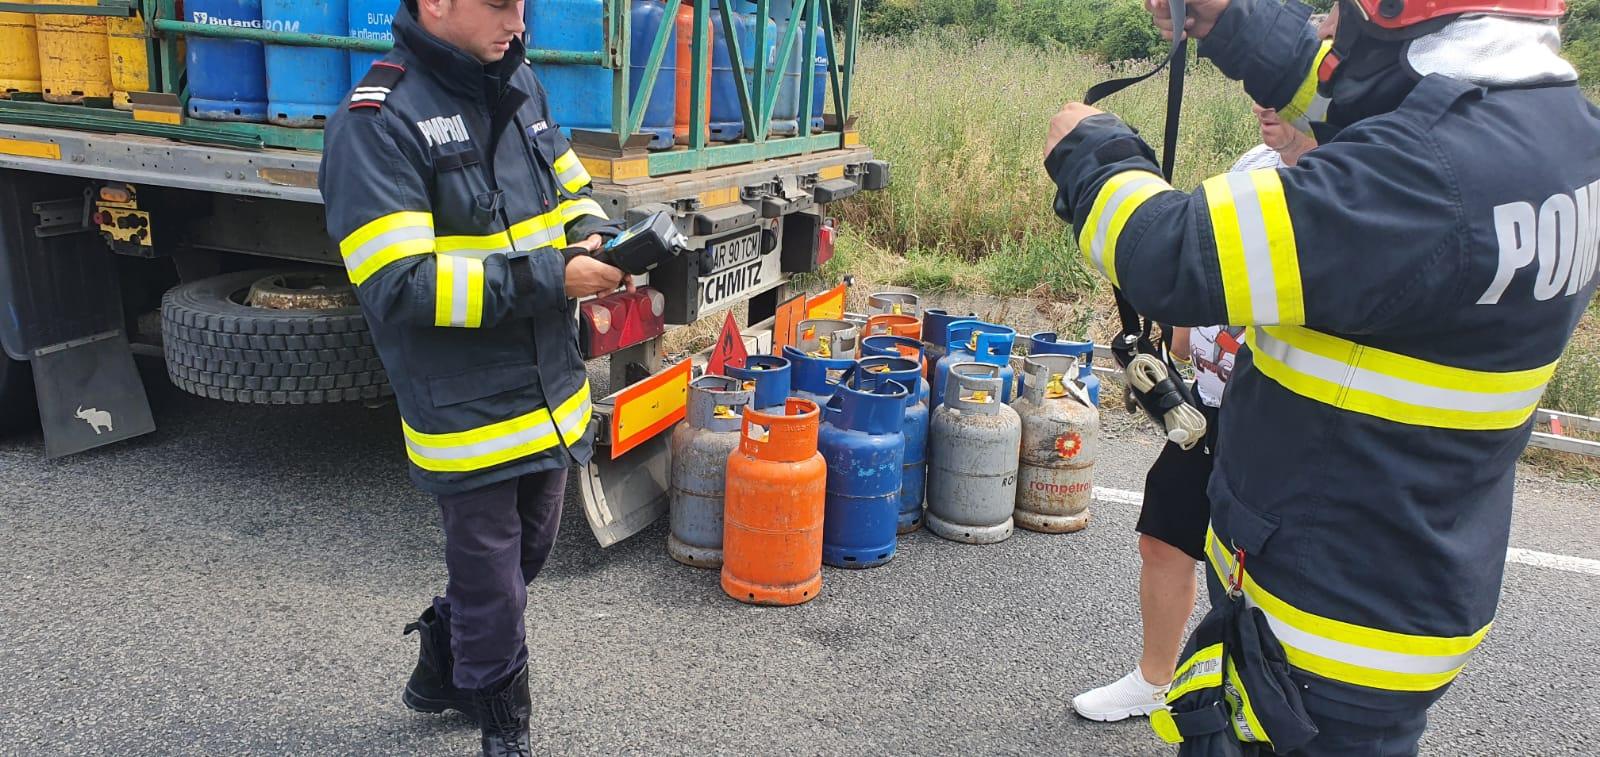 FOTO: Butelii cazute pe carosabil 19.07.2021